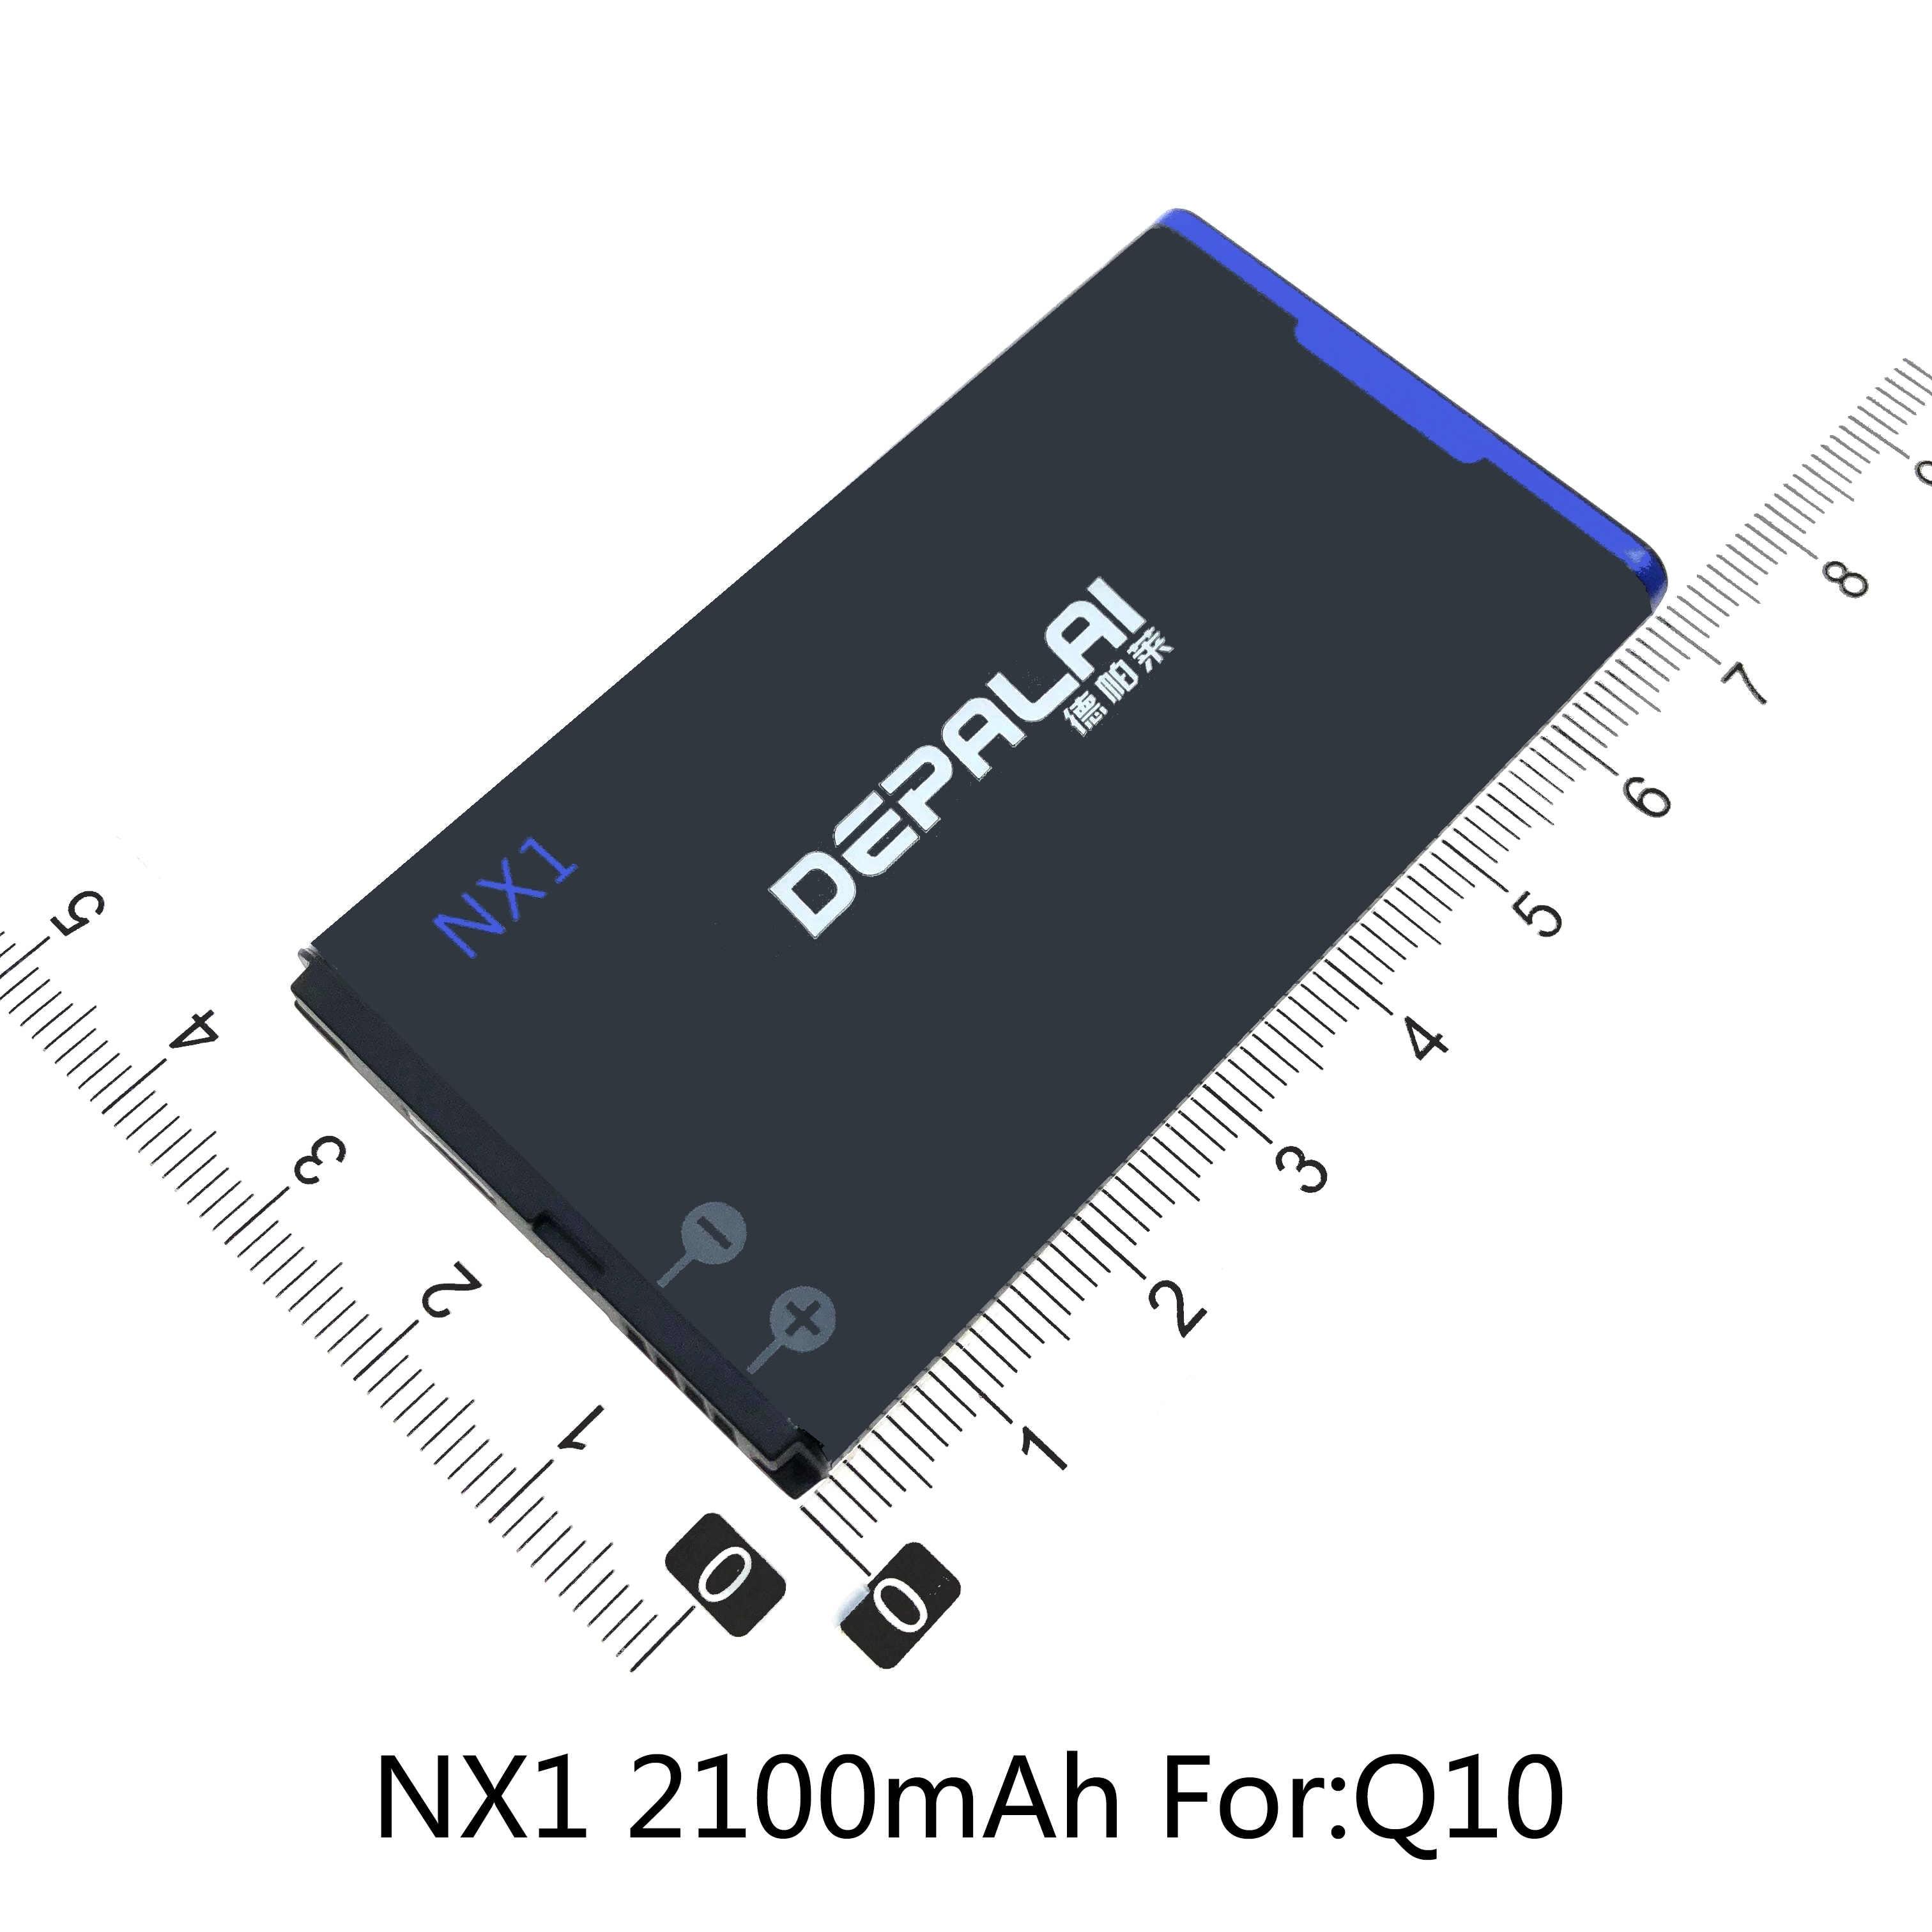 Аккумулятор EM1 JM1 JS1 M-S1 NX1 для Blackberry 9350 9360 9370 9790 9930 9900 P9981 9380 9850 9310 9315 9320 9220 9000 9030 9780 Q10